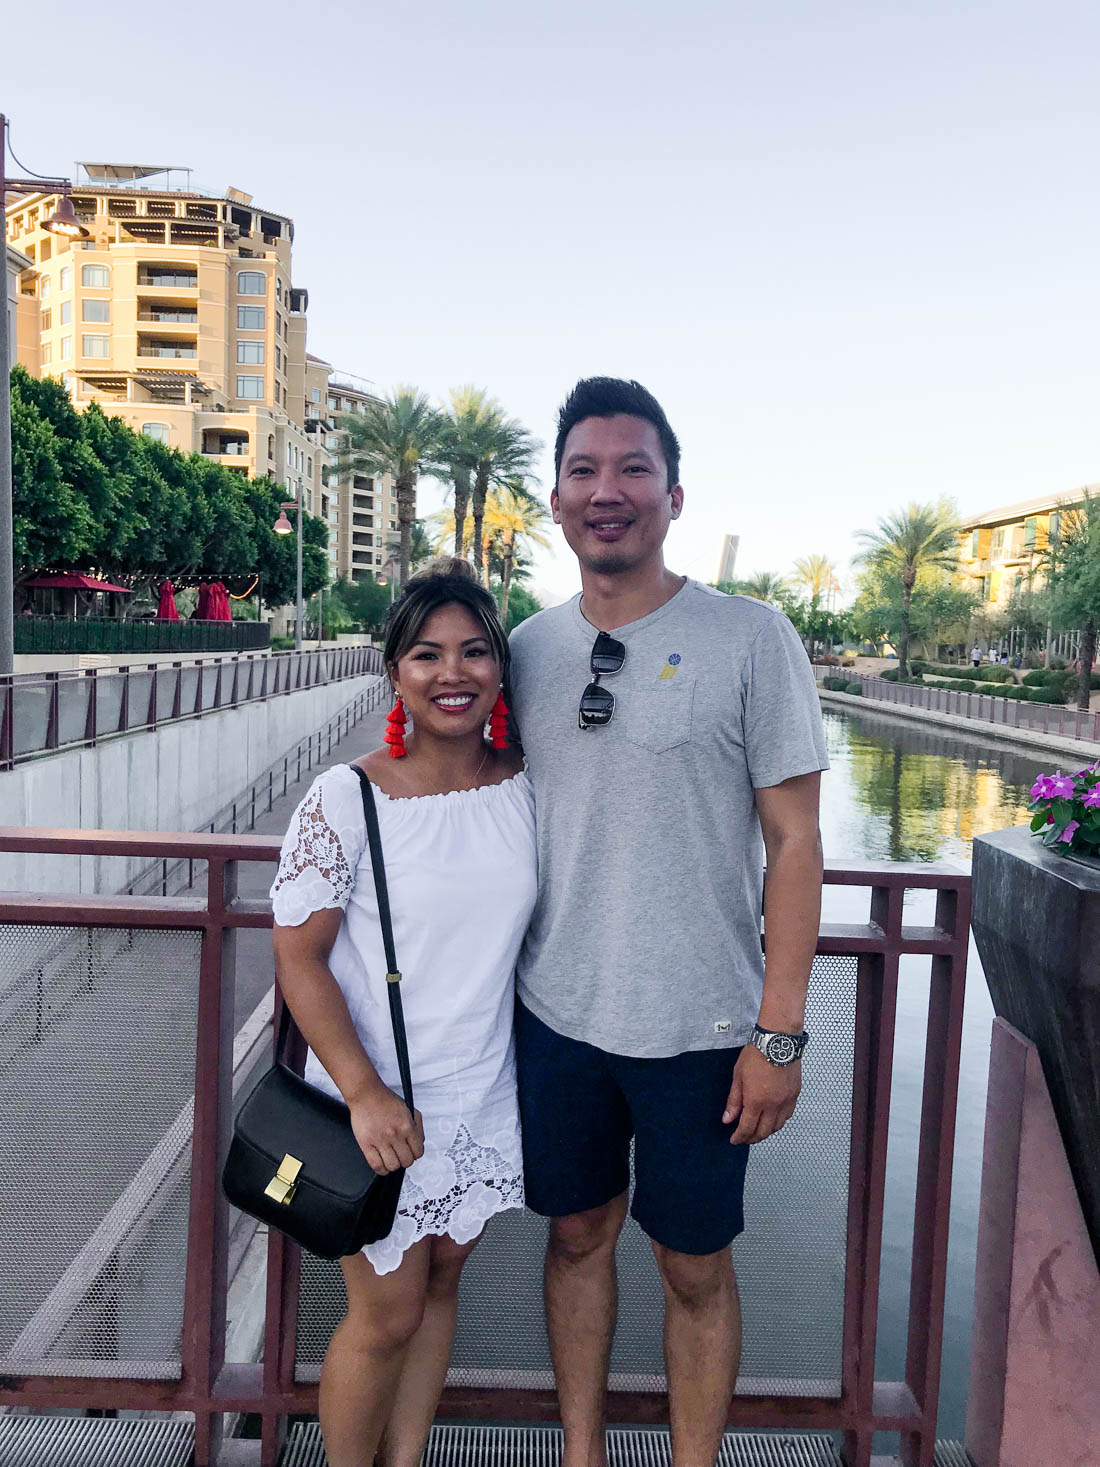 Scottsdale Phoenix Travel Guide & Travel Diary | THE BEAUTY VANITY